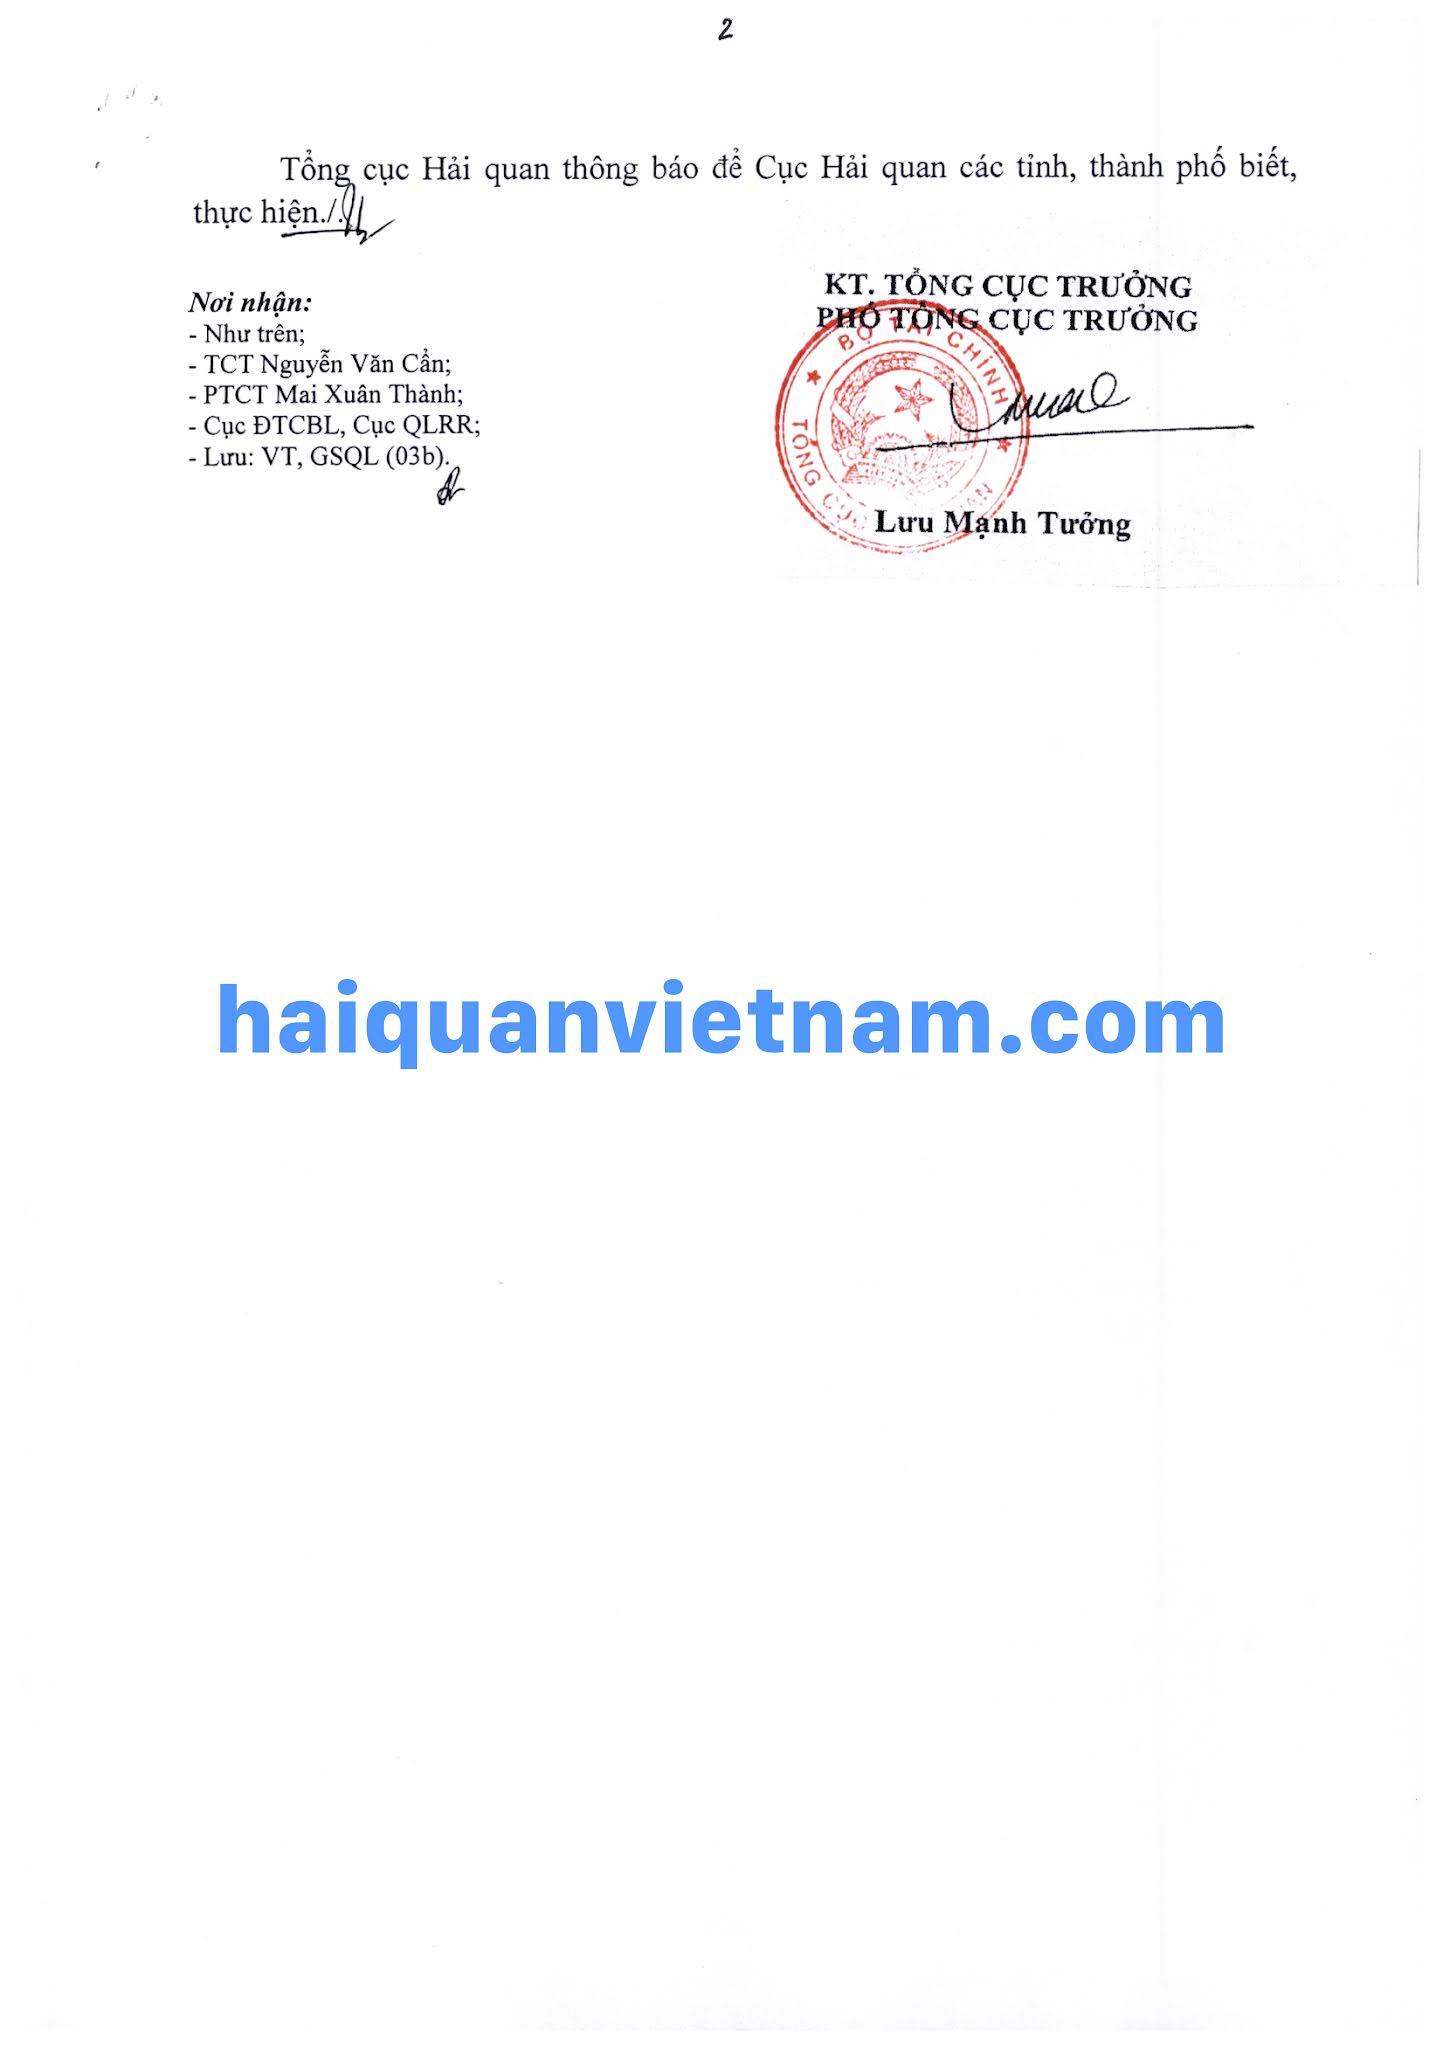 [Image: 210730%2B-%2B3836-TCHQ-GSQL_haiquanvietnam_02.jpg]